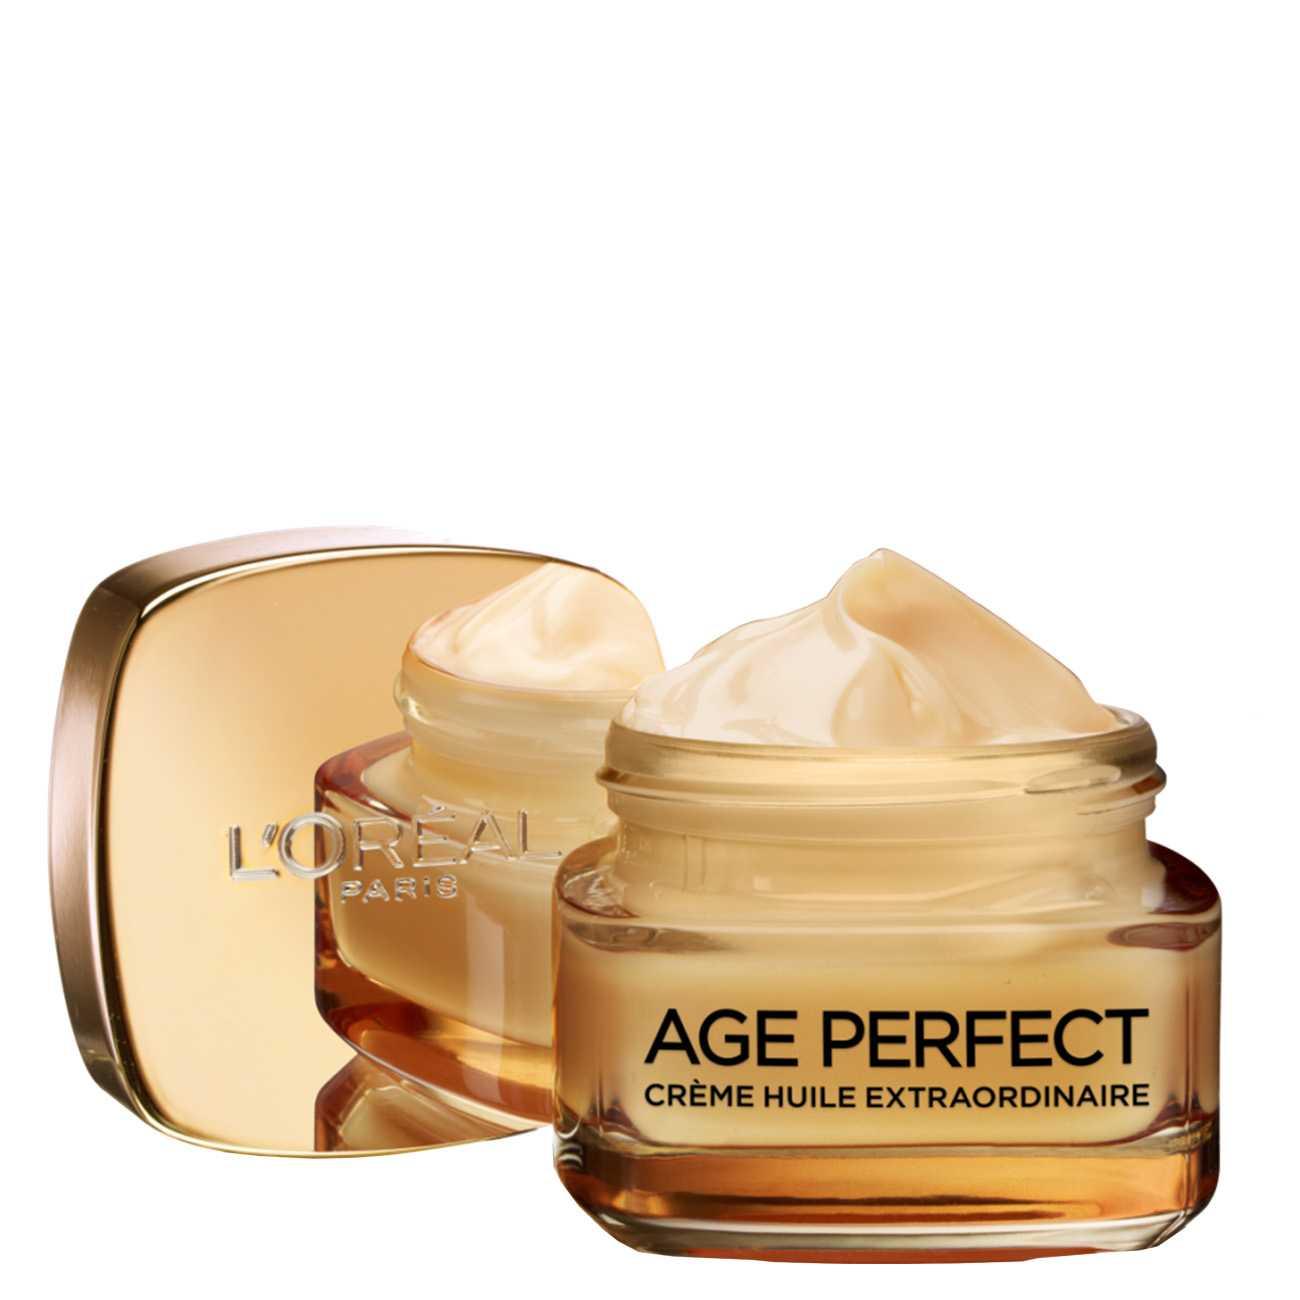 AGE PERFECT EXTRAORDINARY 50 ML imagine produs